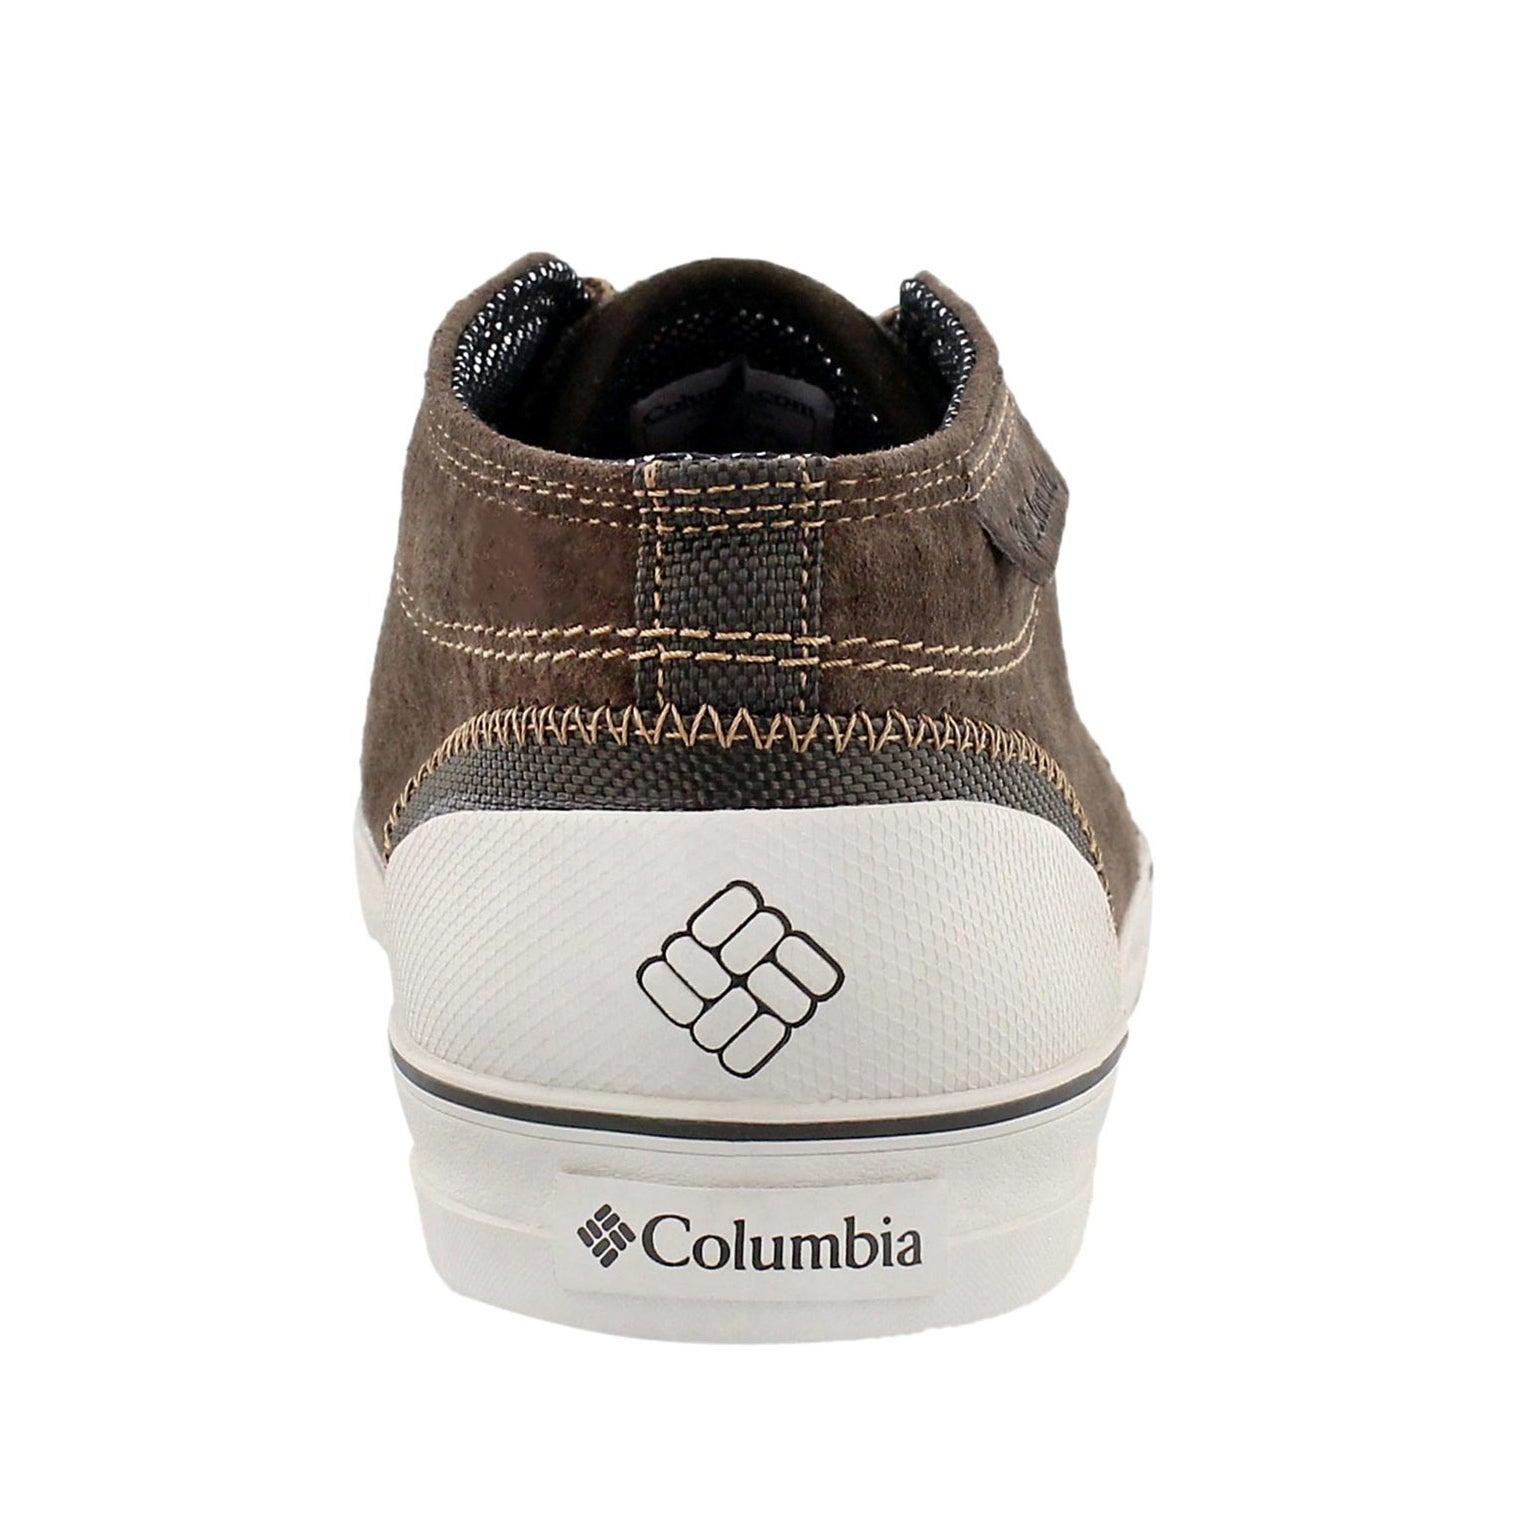 Chaussure déc. Vulc Half Dome, brun, hom